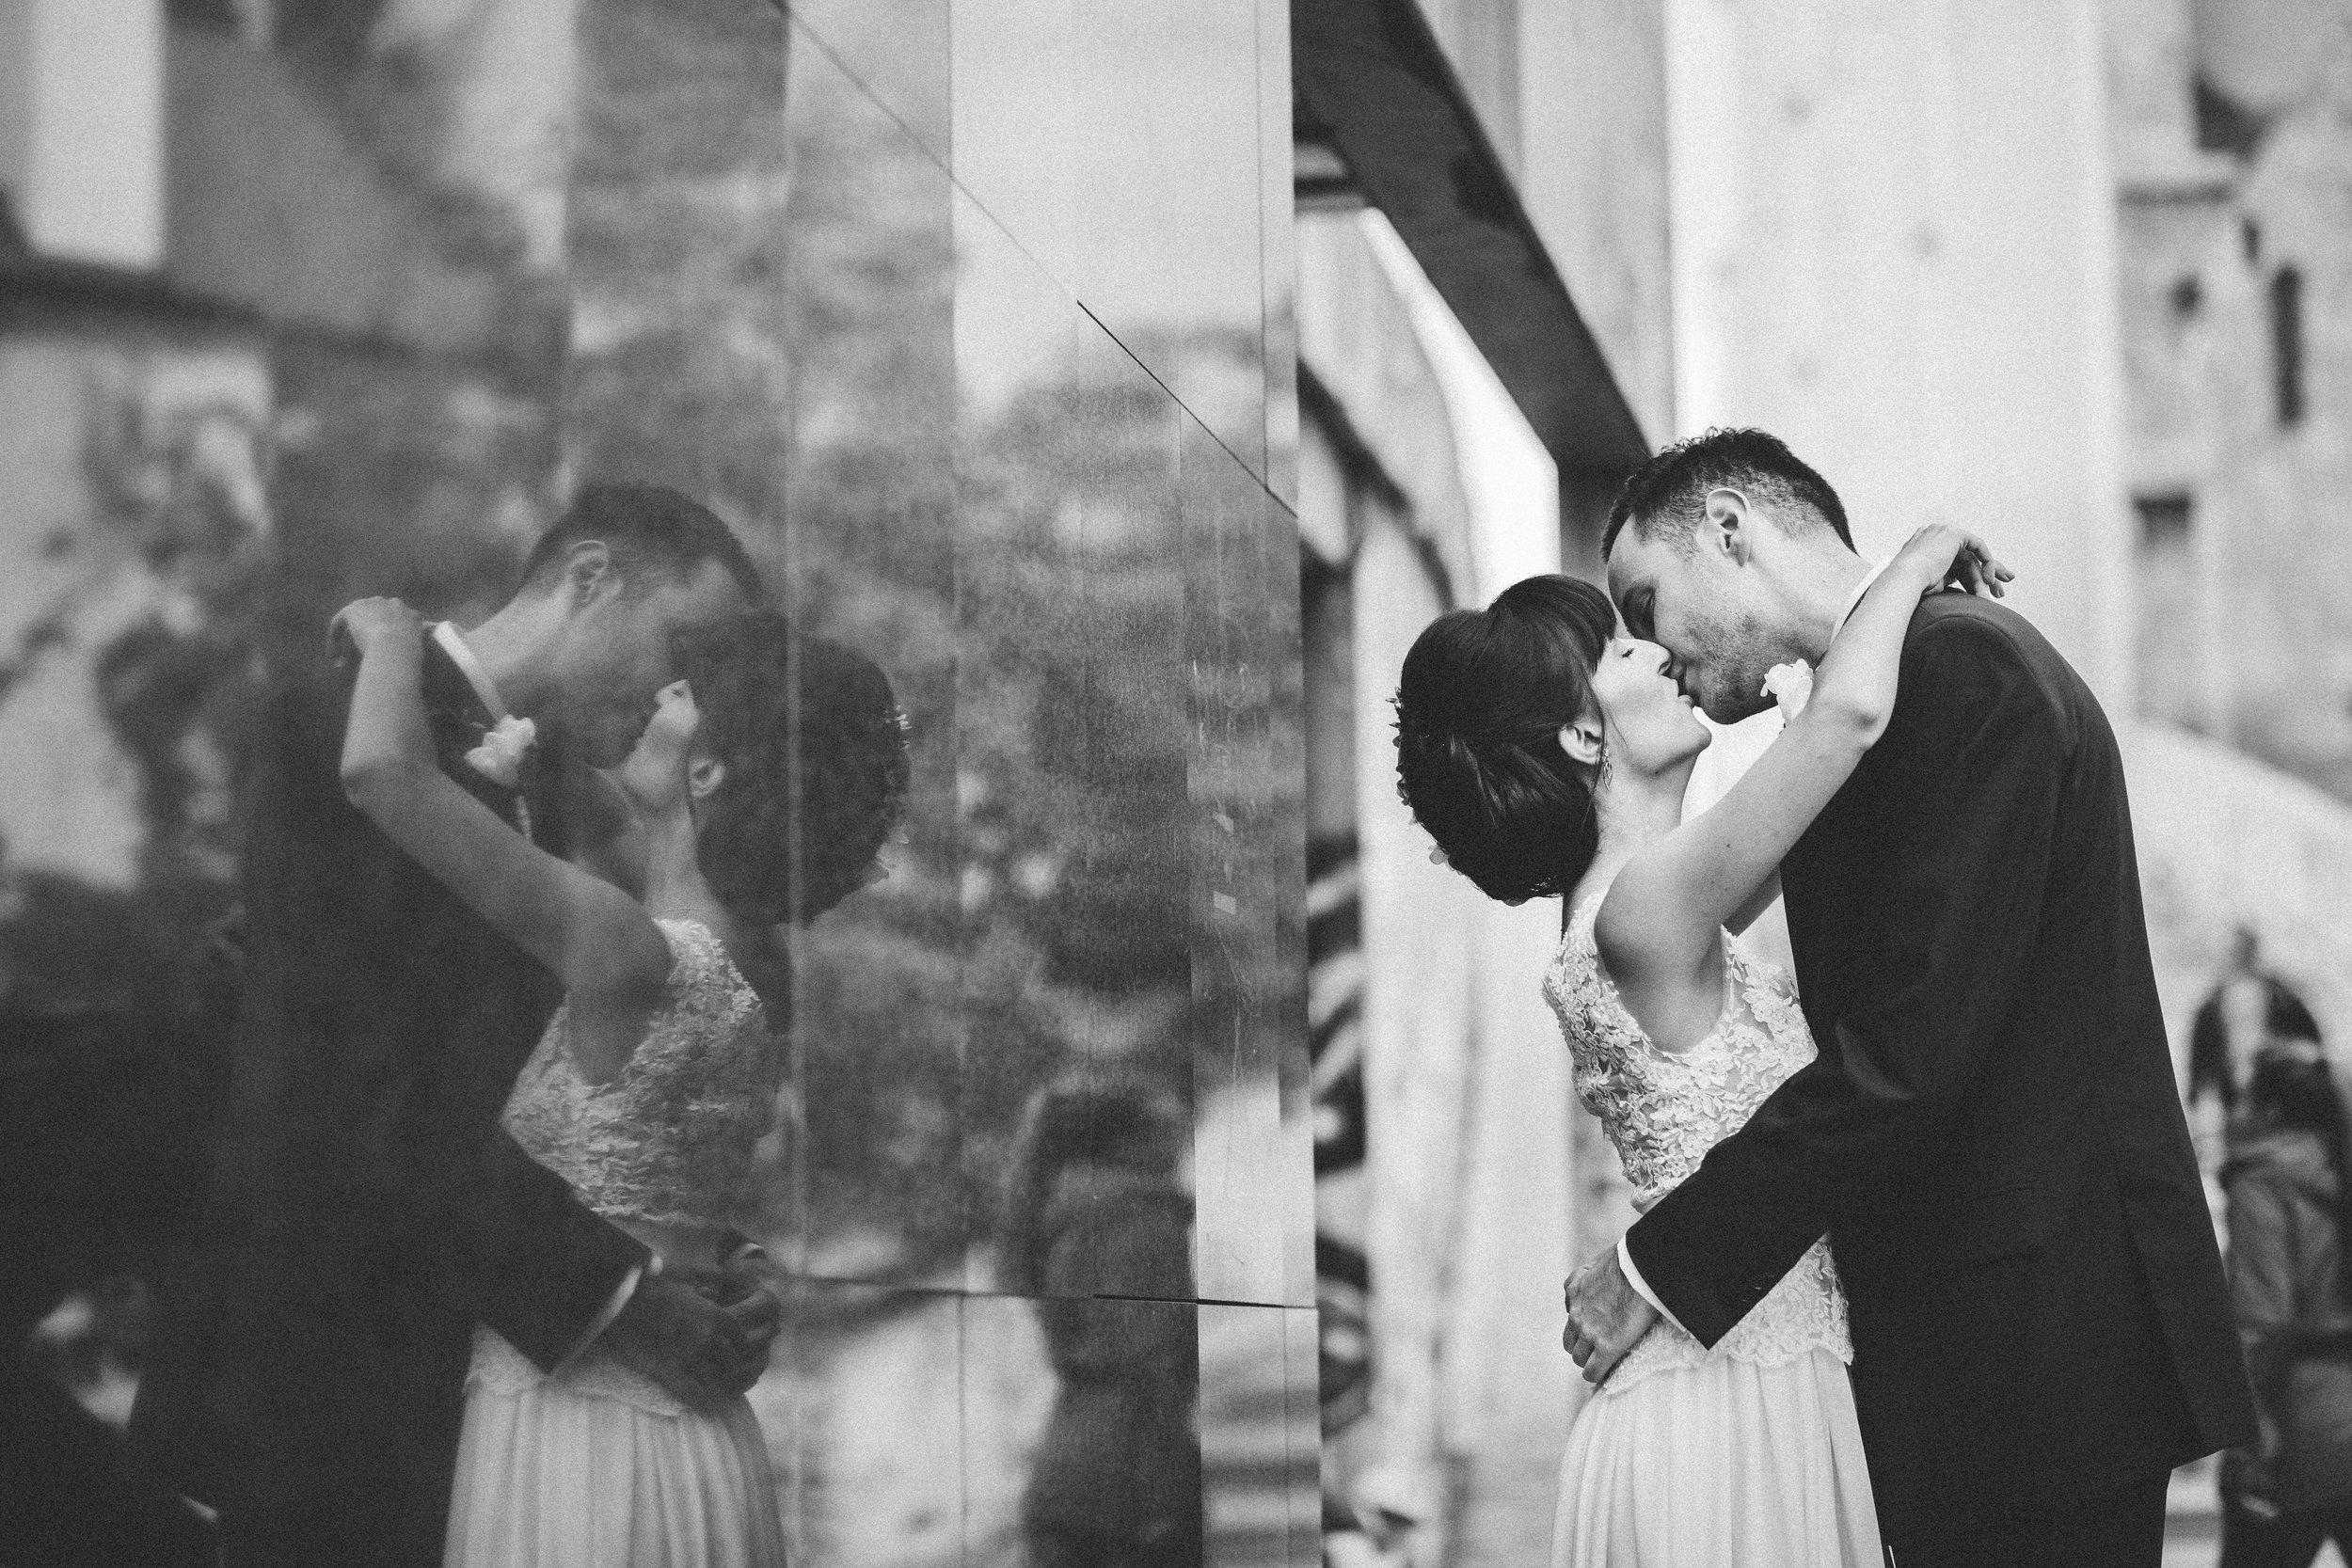 destination-wedding-photographer-bratislava-slovakia-europe-portrait-session-bw-3.jpg